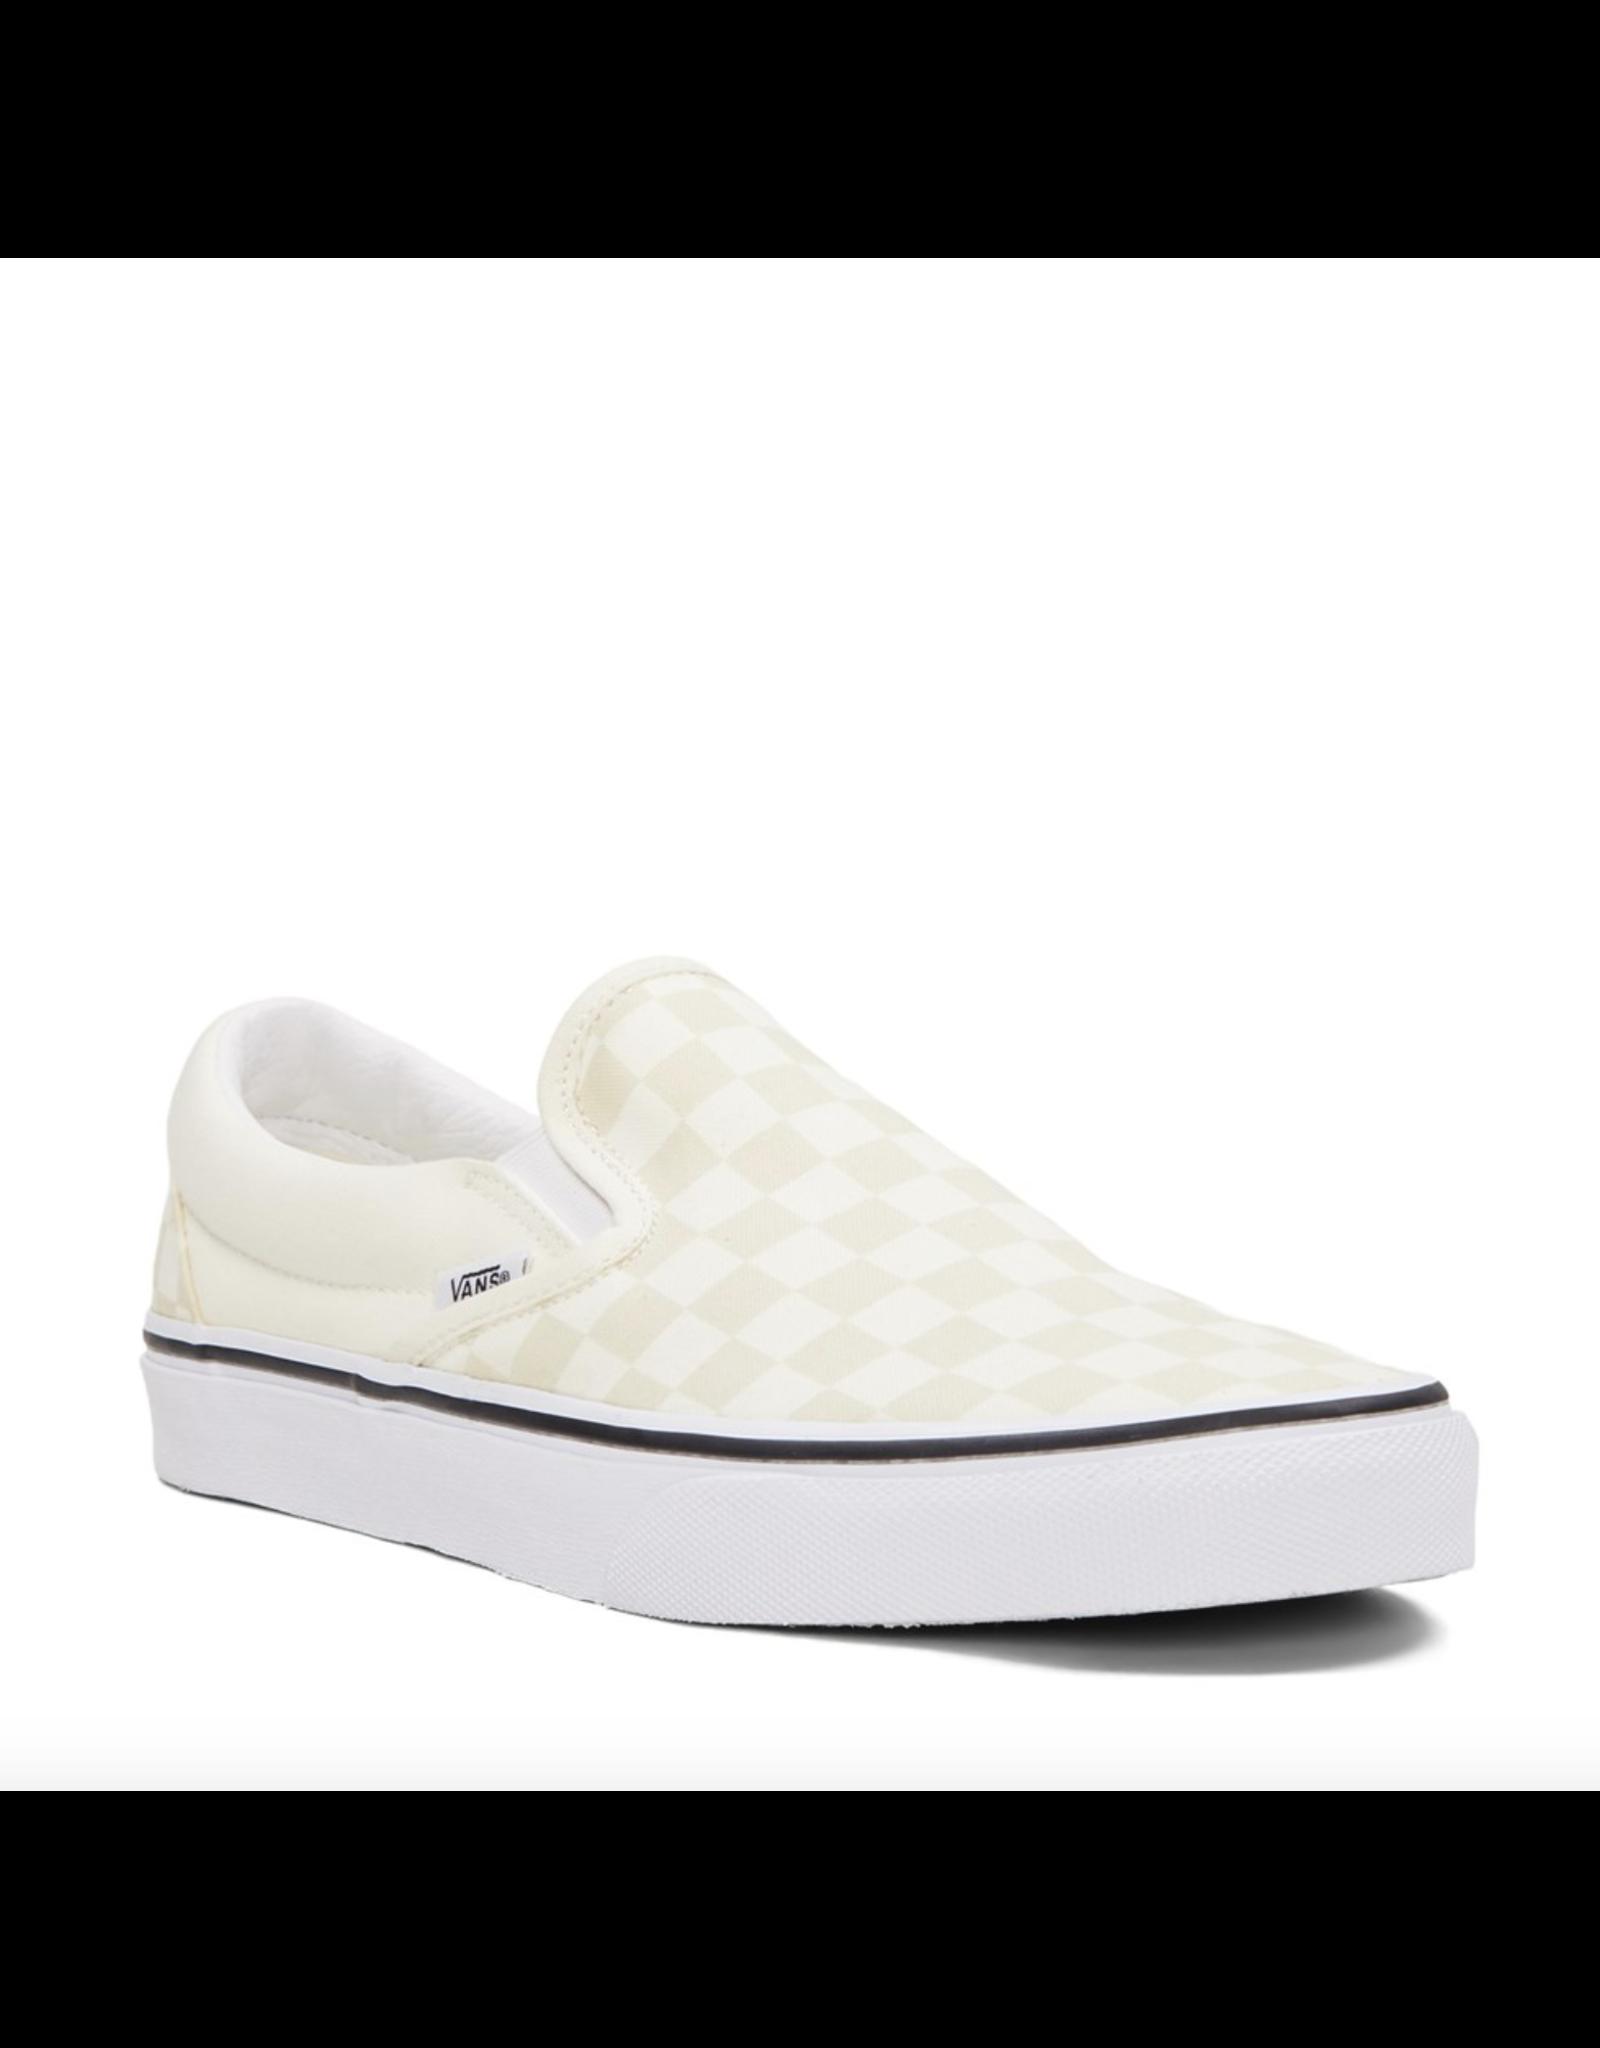 Vans Classic Slip-On - Classic White Checkerboard